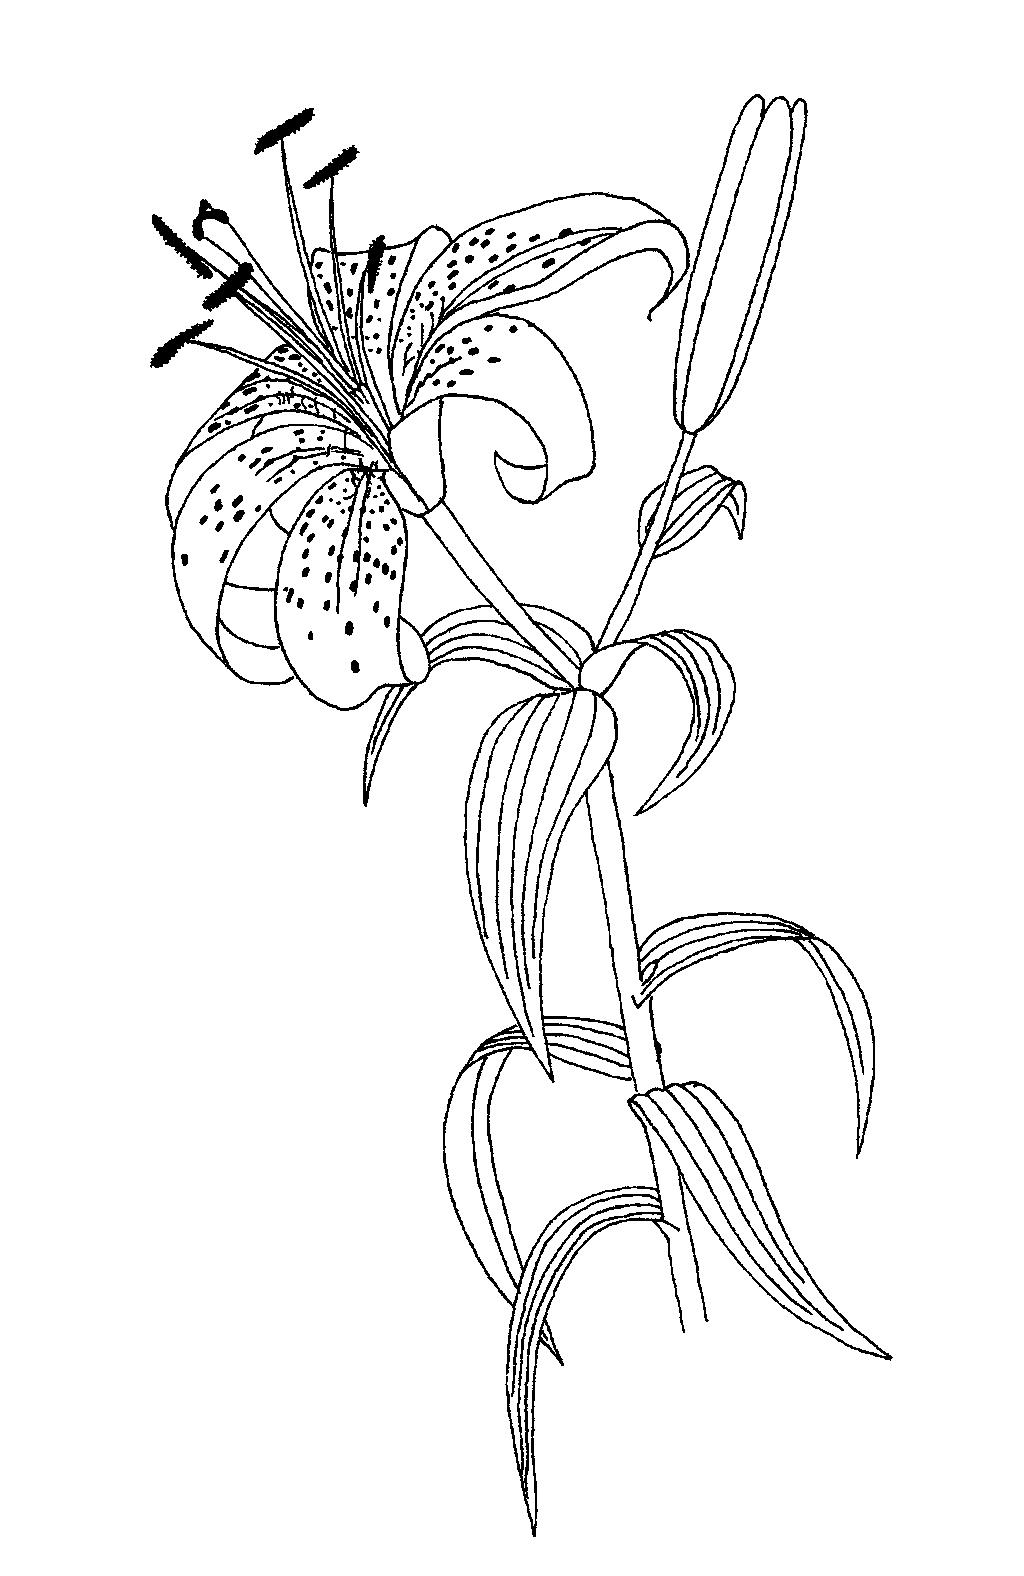 Lilium Sp Coloring Sheet In 2020 Flower Coloring Sheets Flower Coloring Pages Flower Drawing